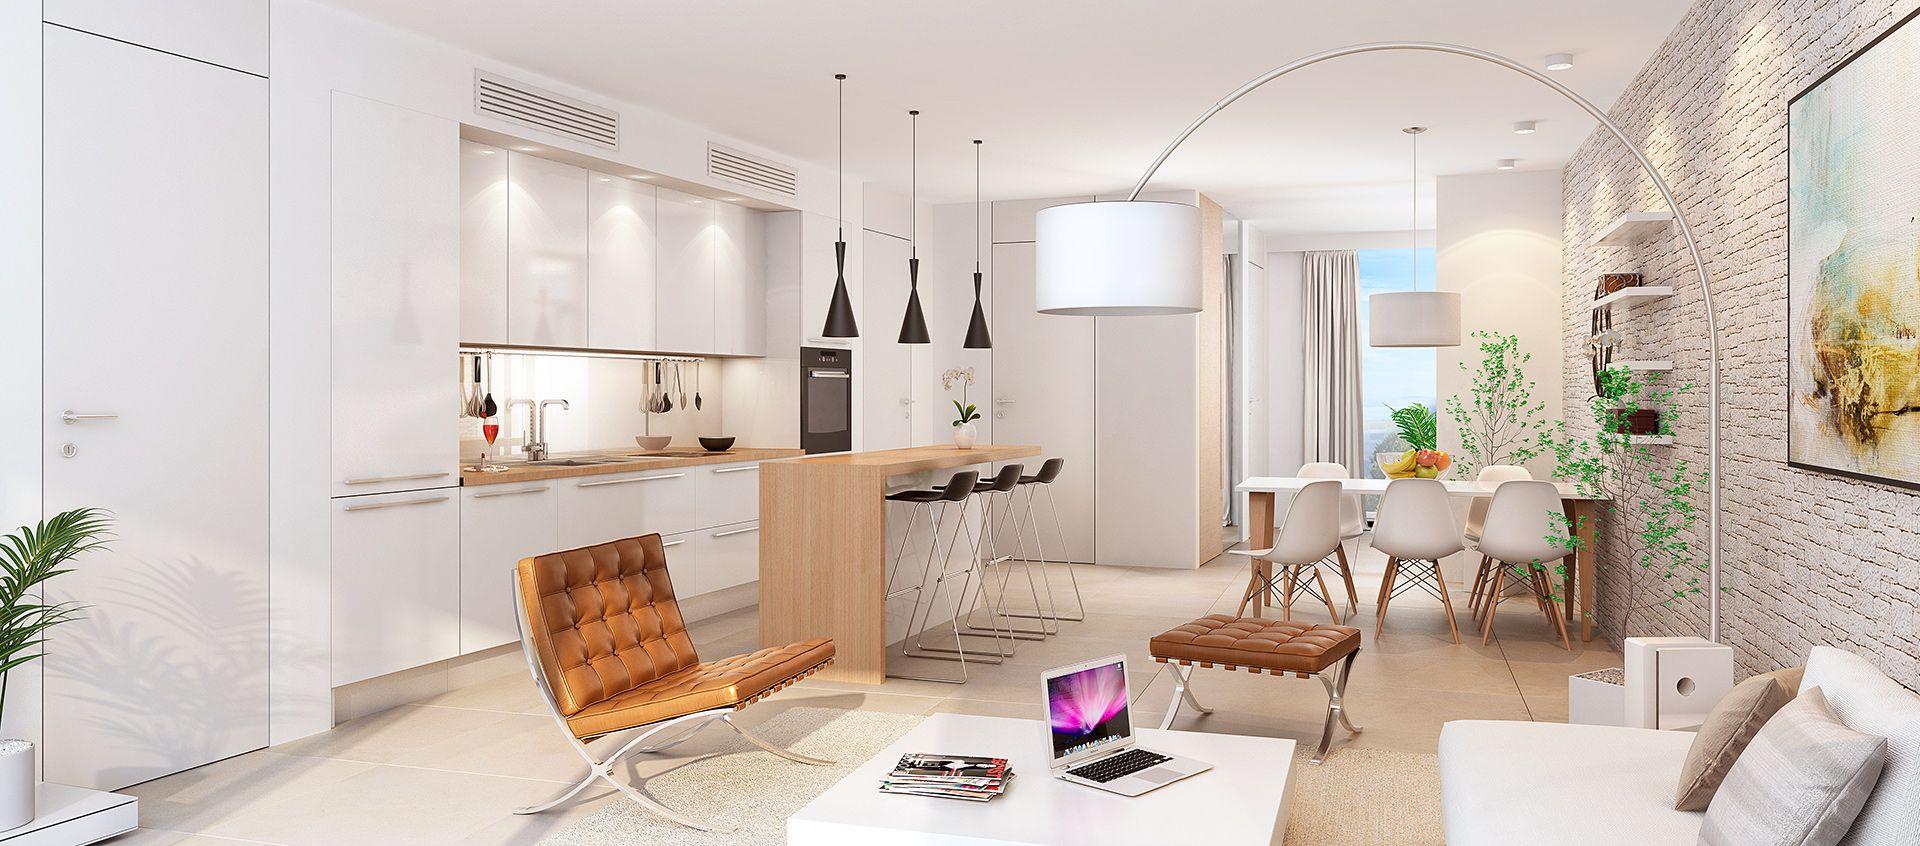 50m2 apartment design Google Search Interieur, Studio